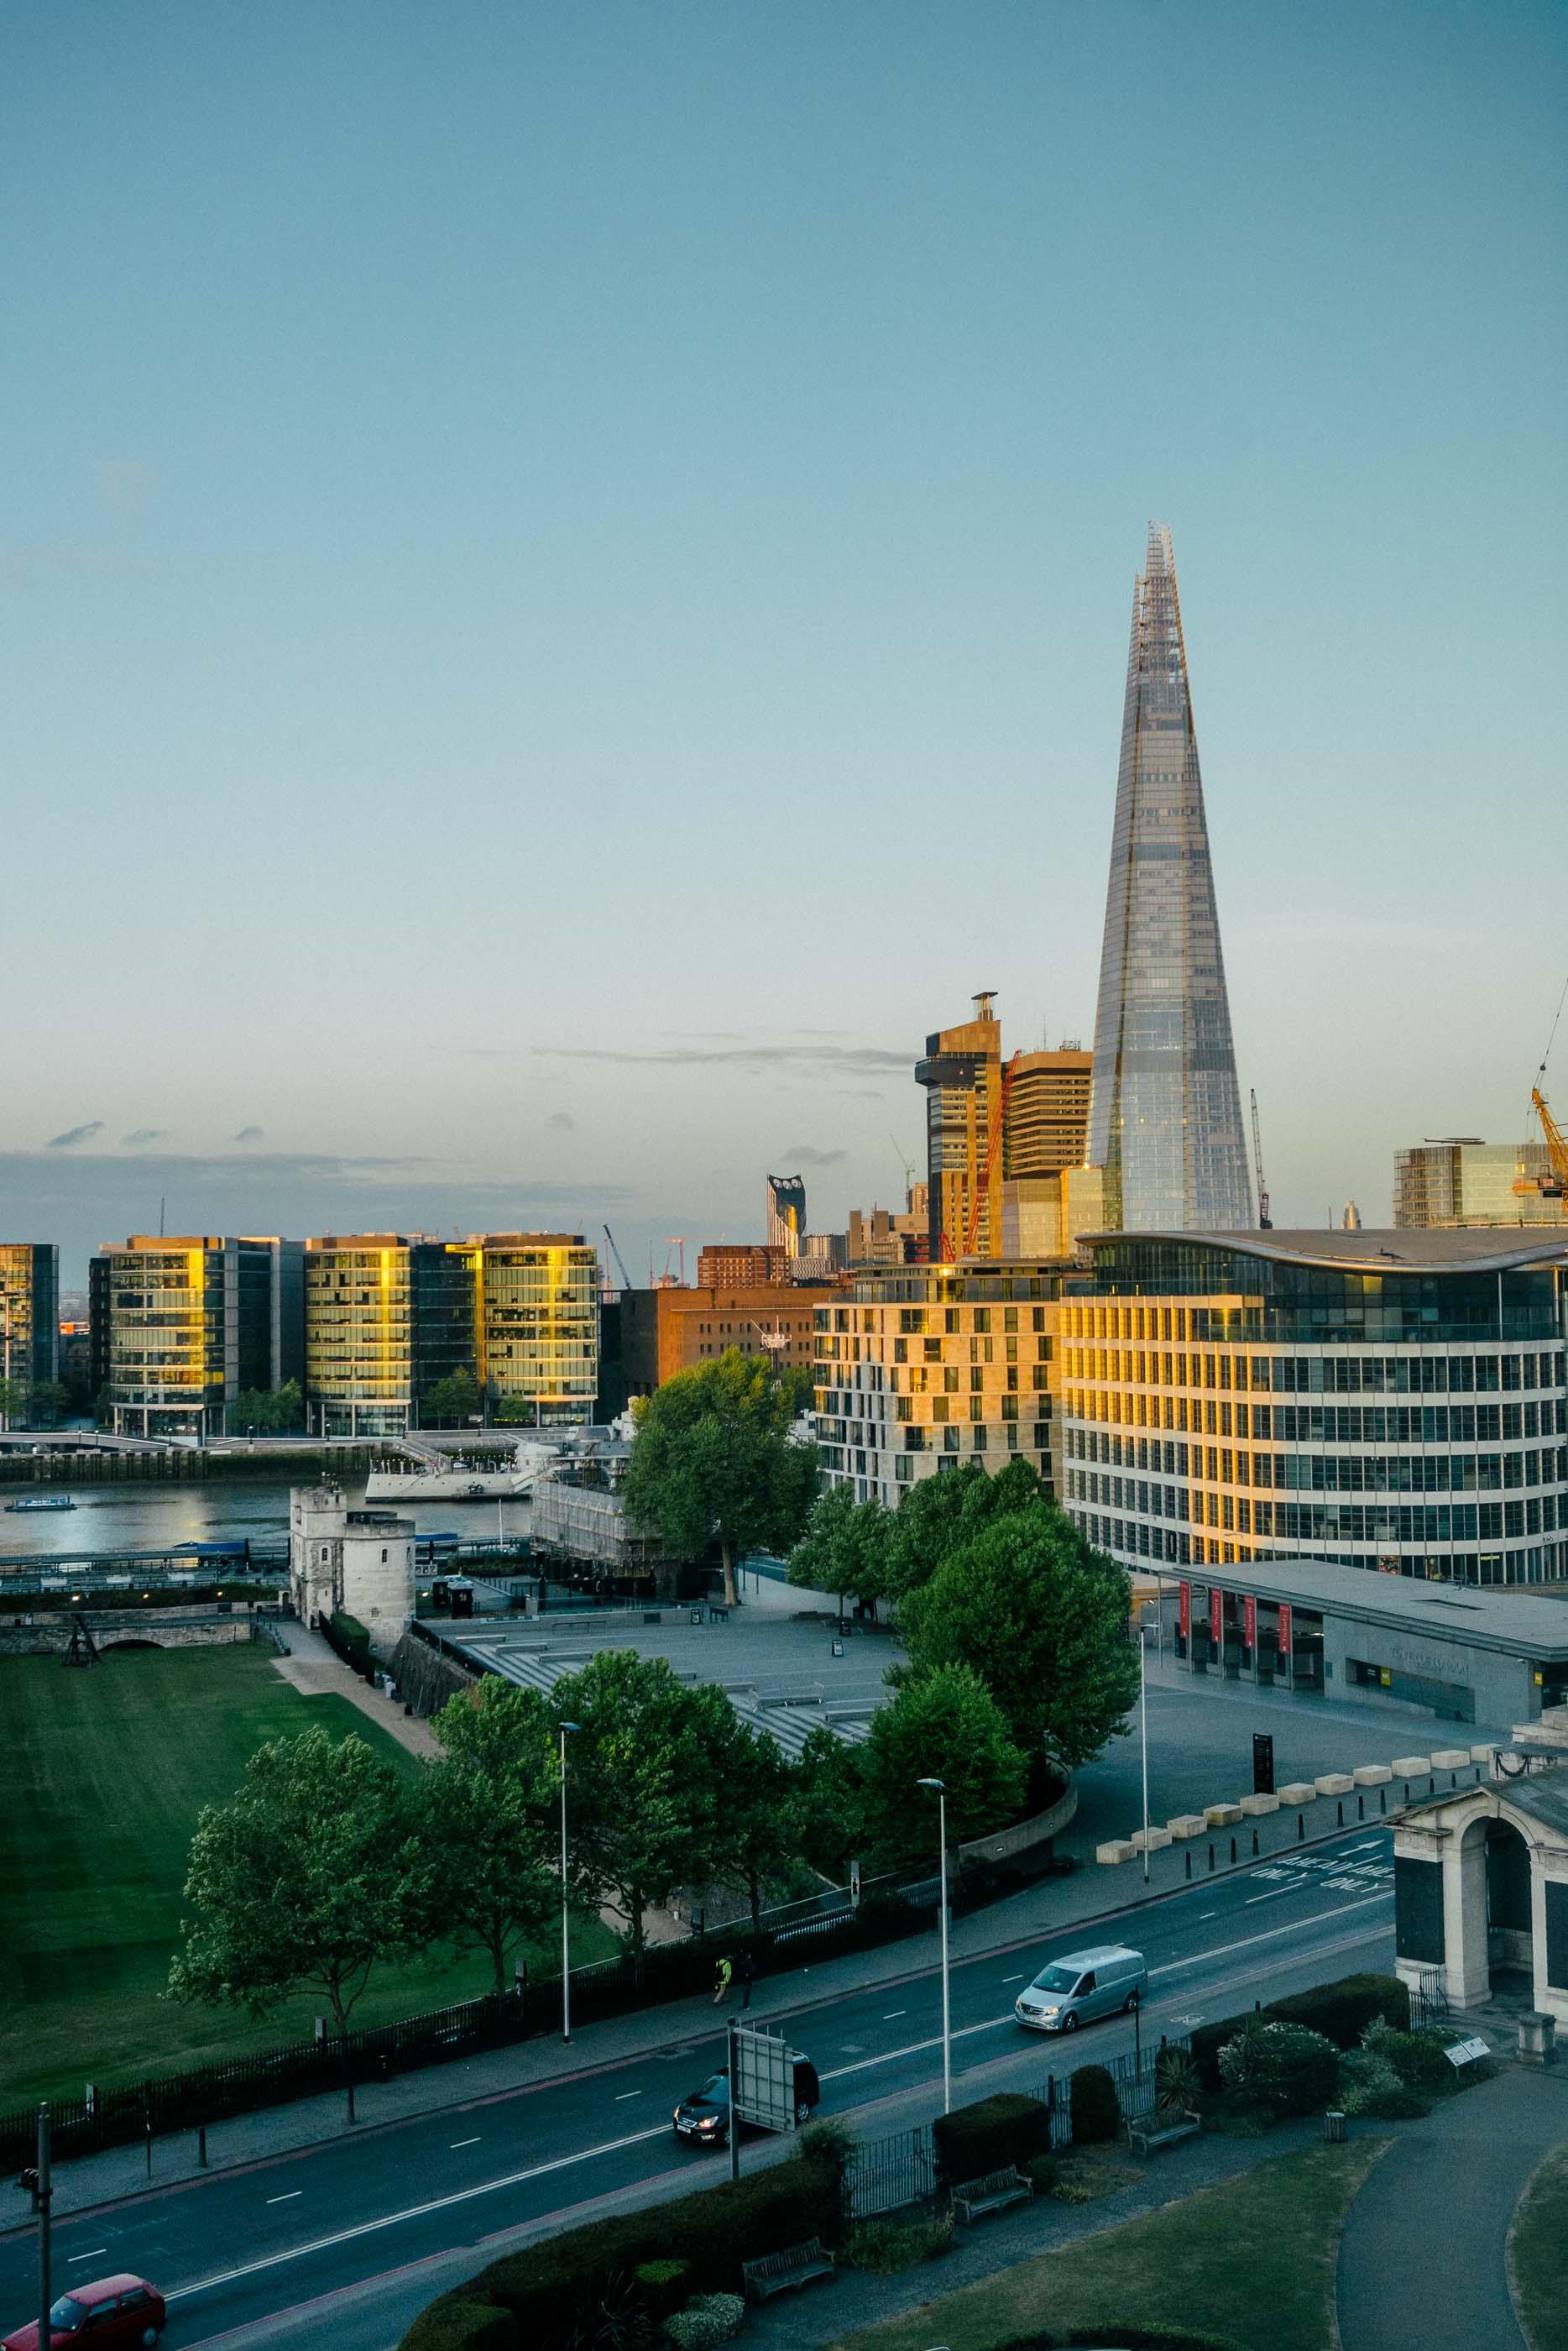 MYBELONGING-CITIZENM-LONDON-TOWER-HILL-TRAVEL-PHOTOGRAPHY-11.jpg